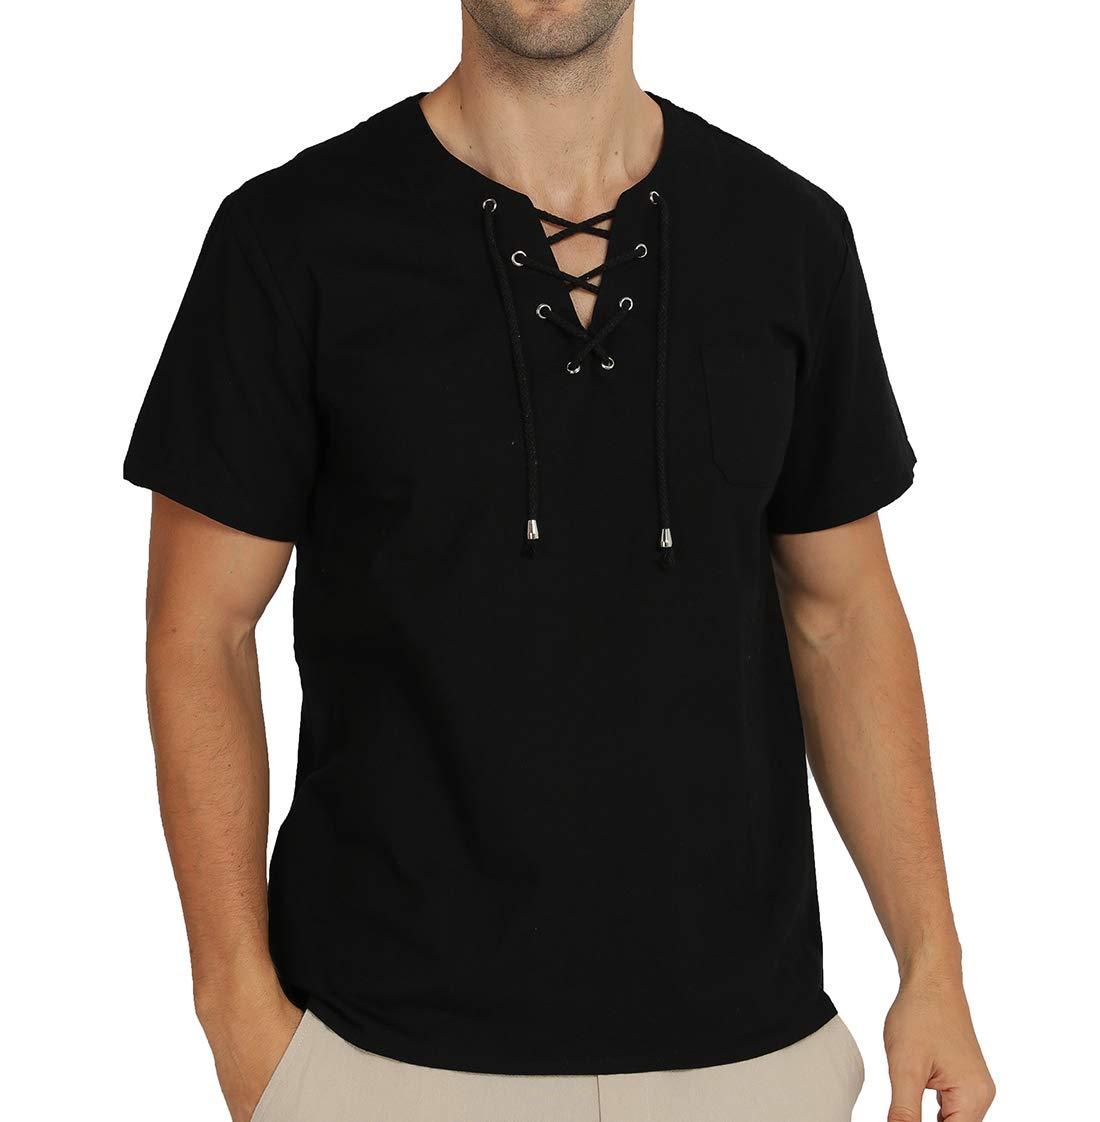 WULFUL Men's Casual Short Sleeve Hippie Summer Beach Yoga Shirts Cotton Fashion T-Shirt